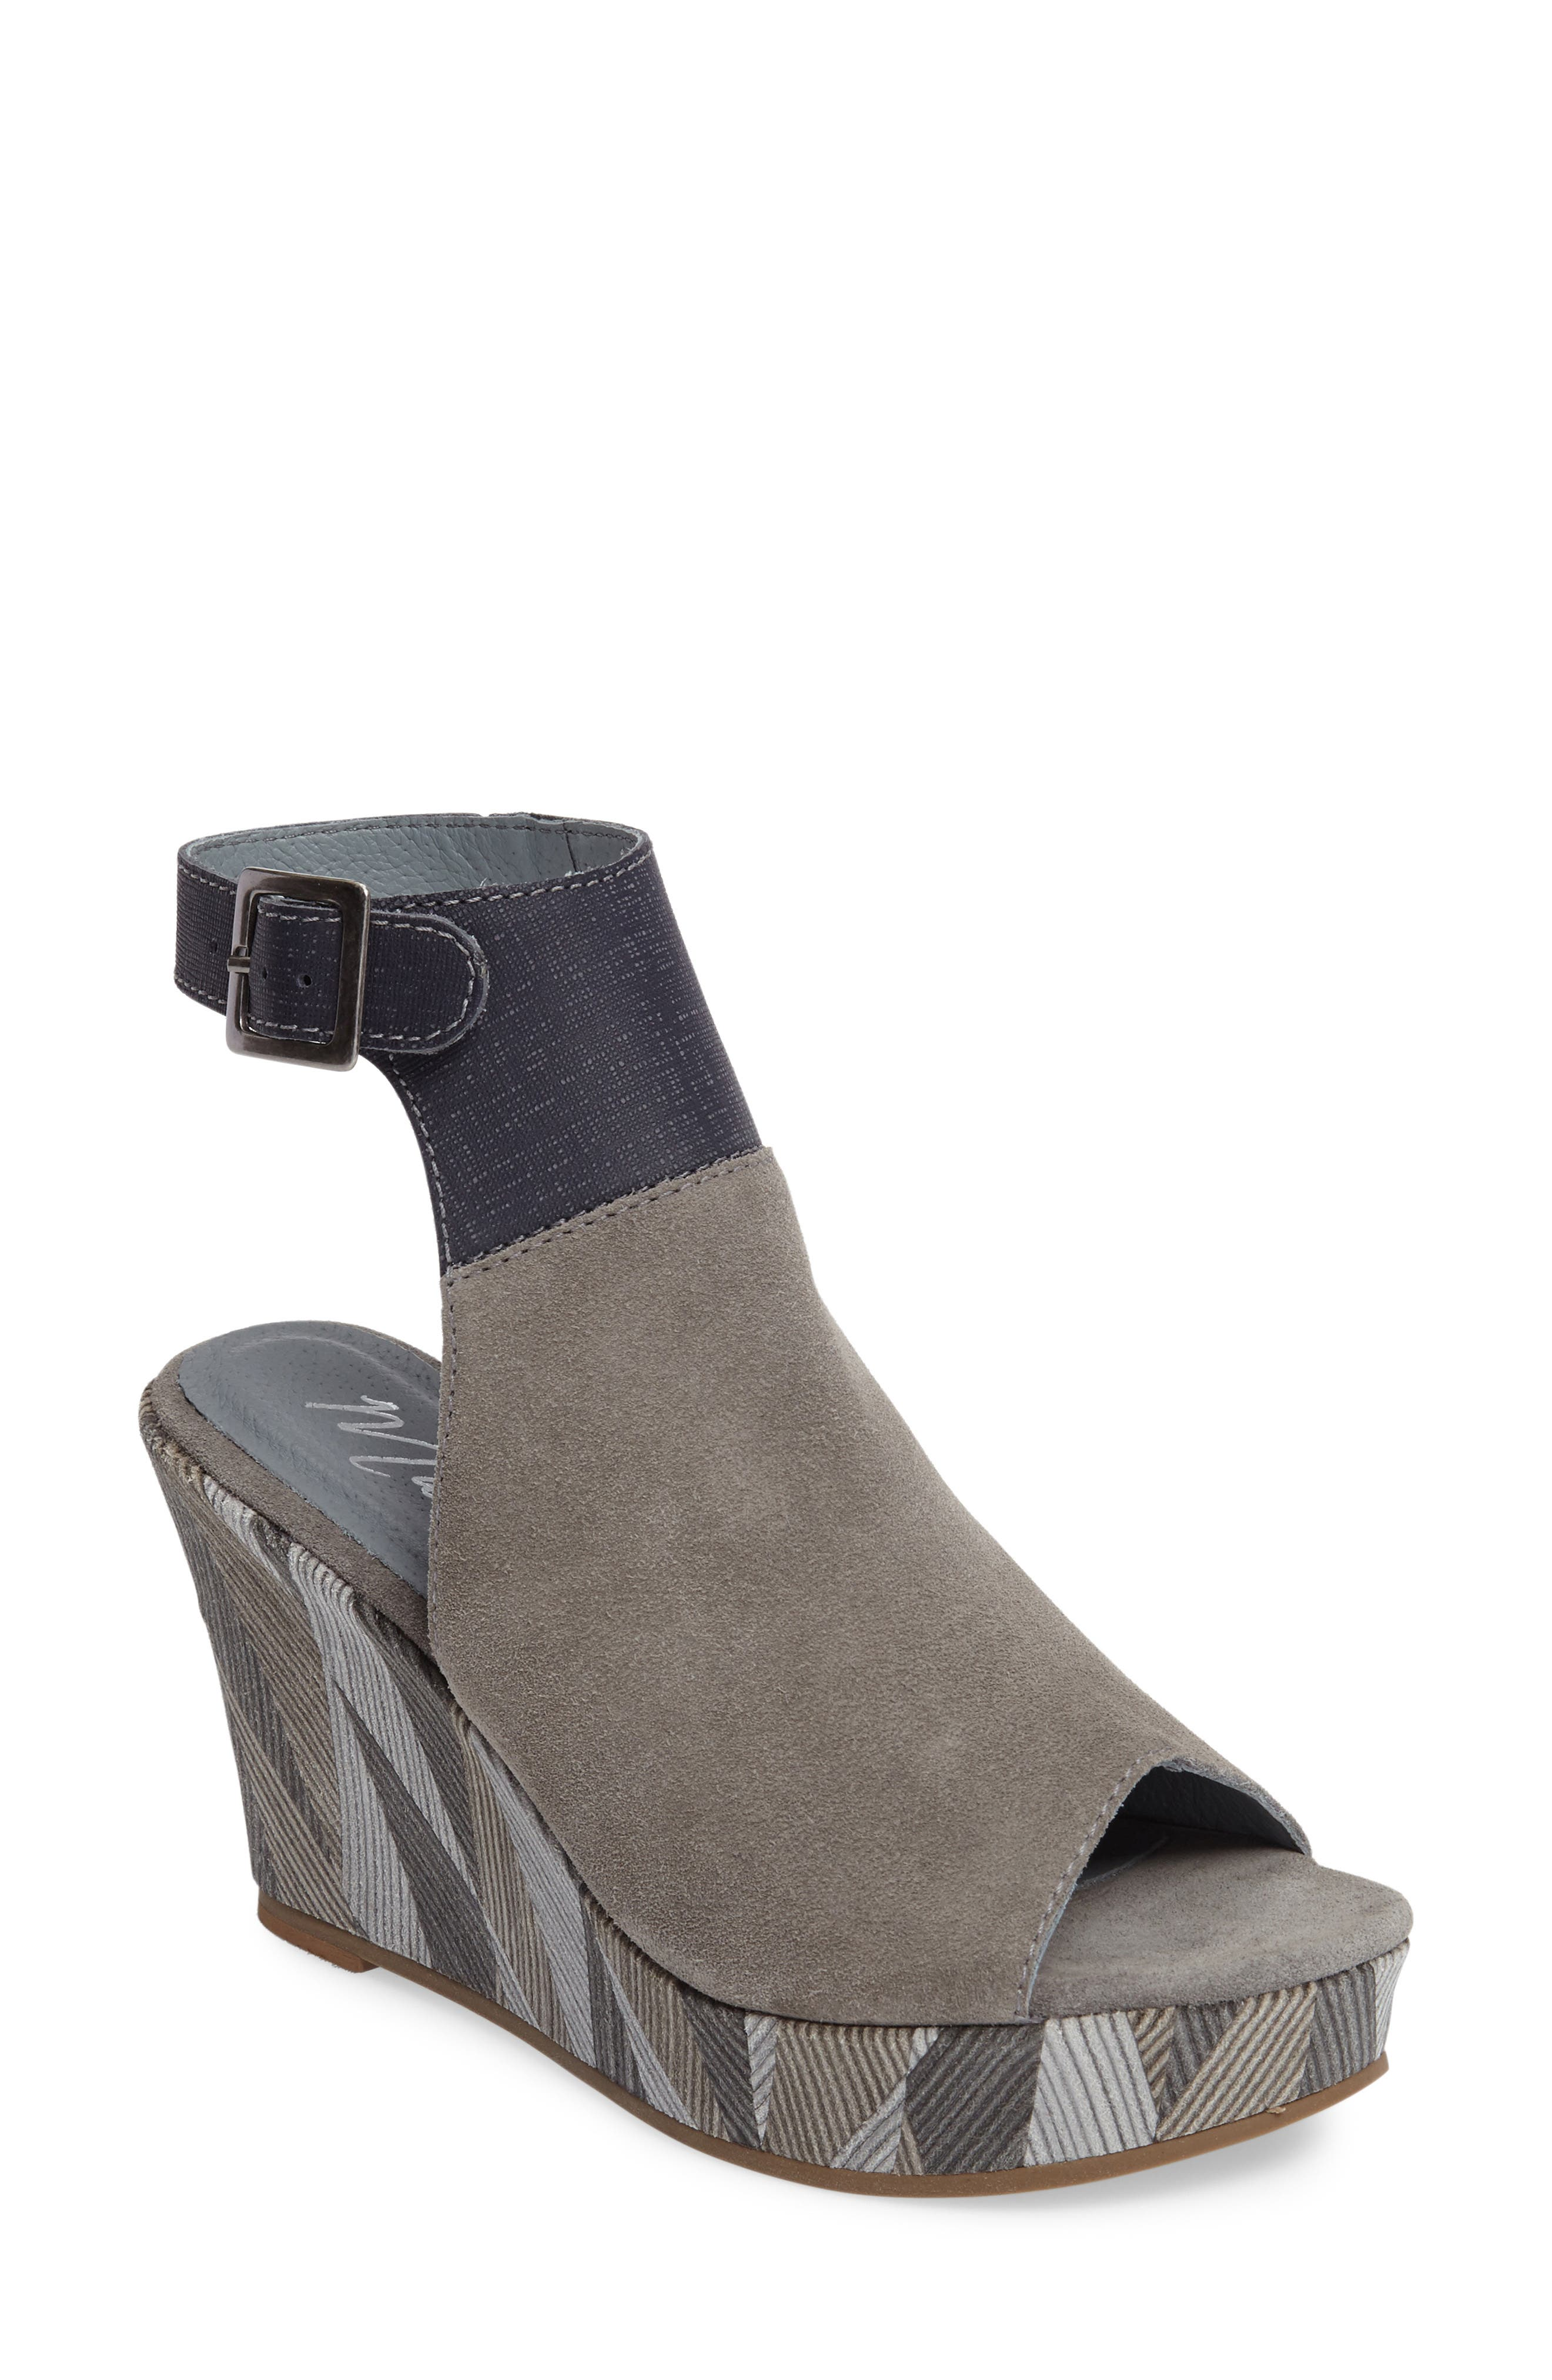 Harlequin Wedge Sandal,                             Main thumbnail 1, color,                             029